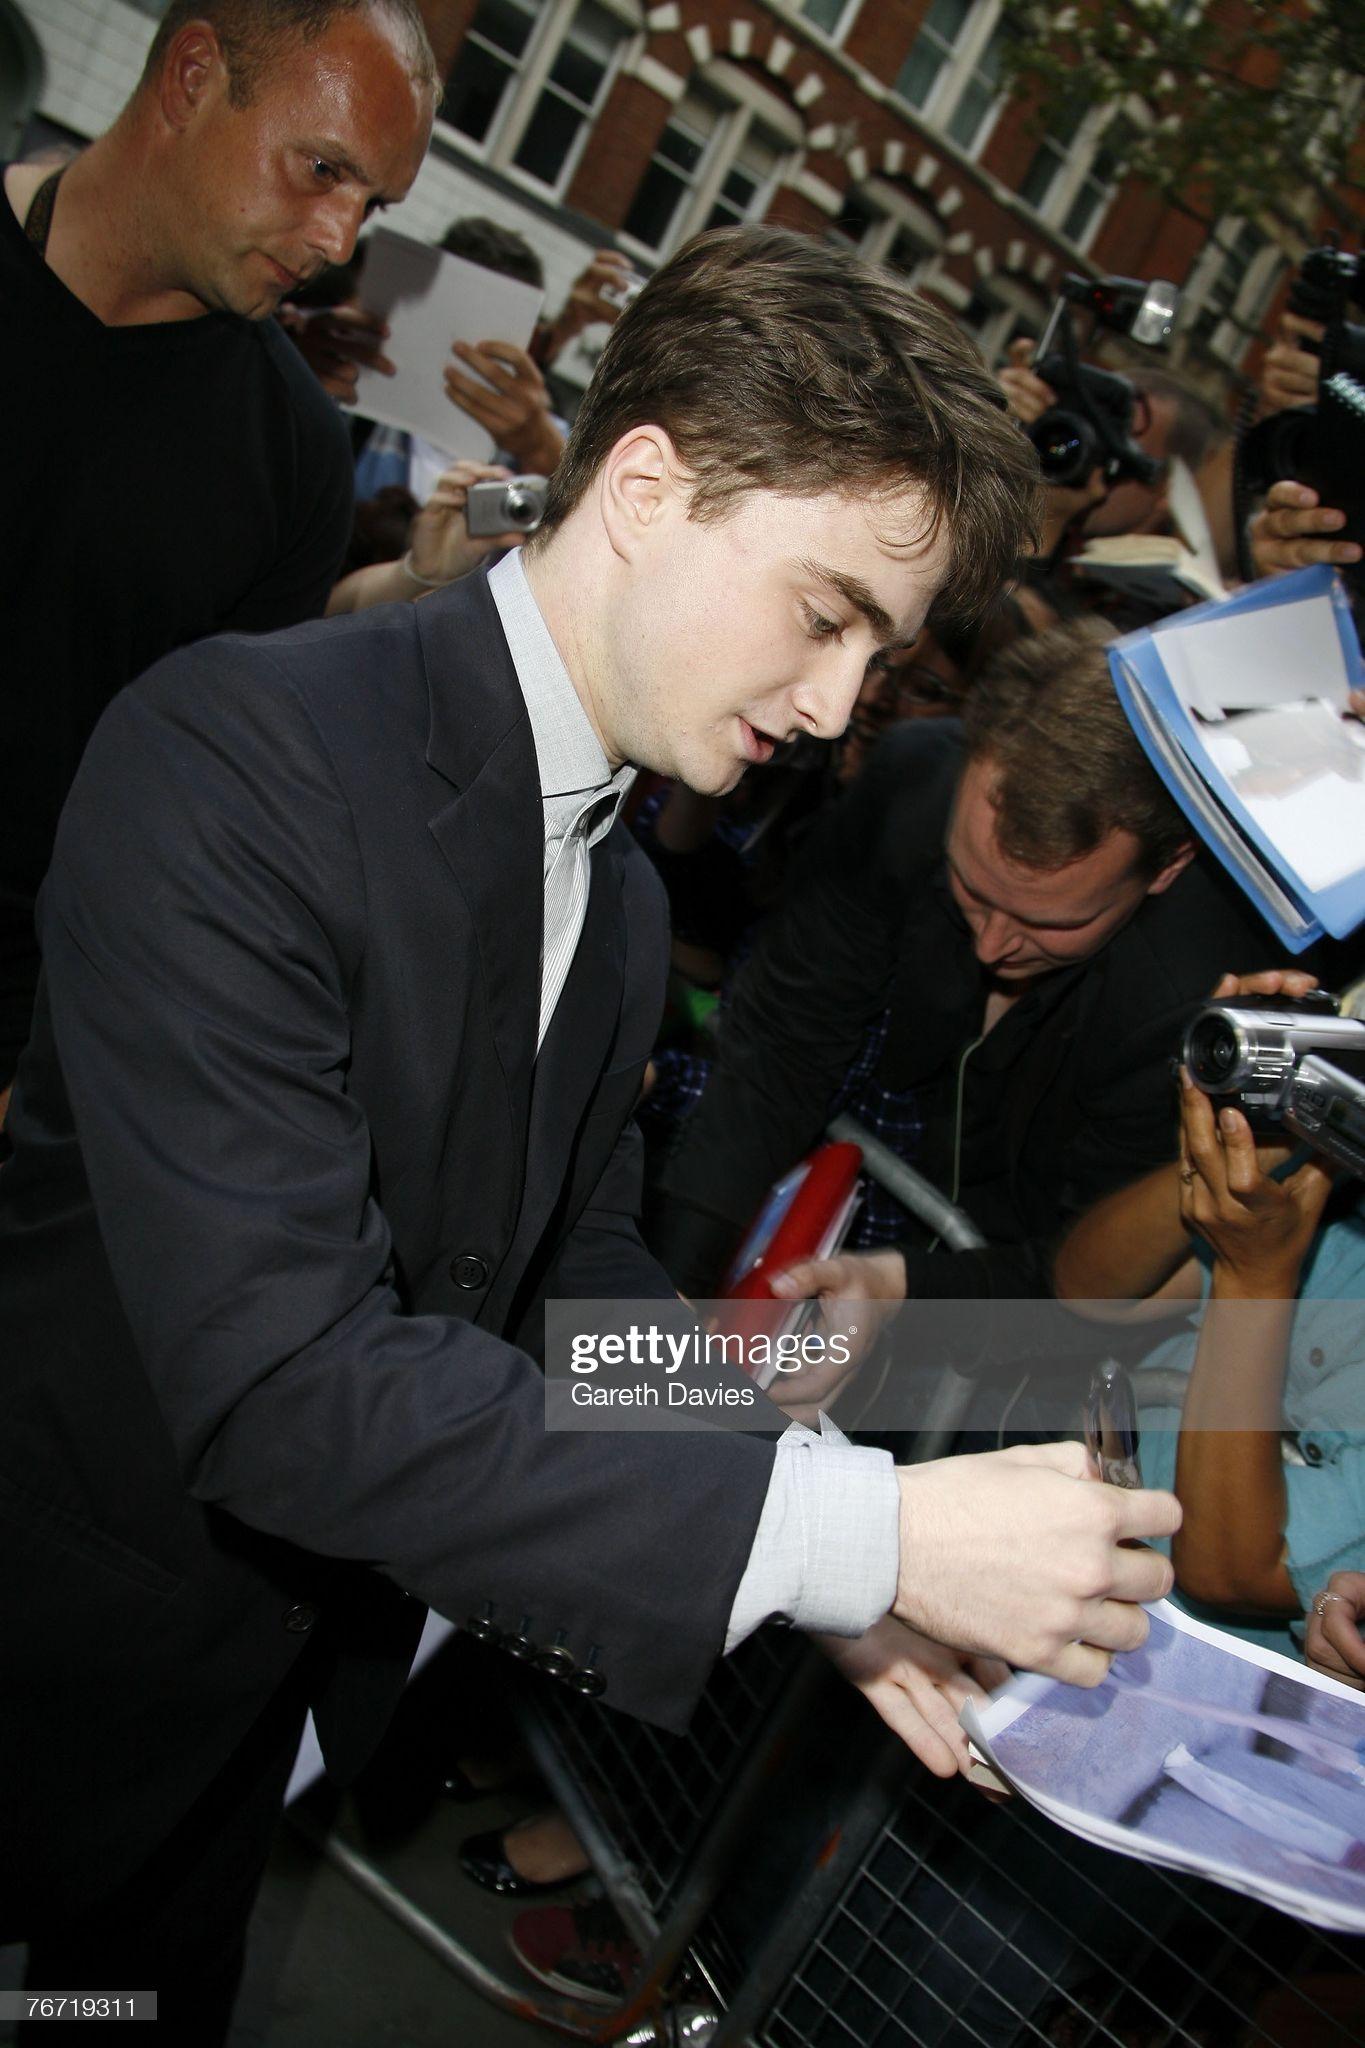 Daniel Radcliffe arrives for the premiere of 'Dece